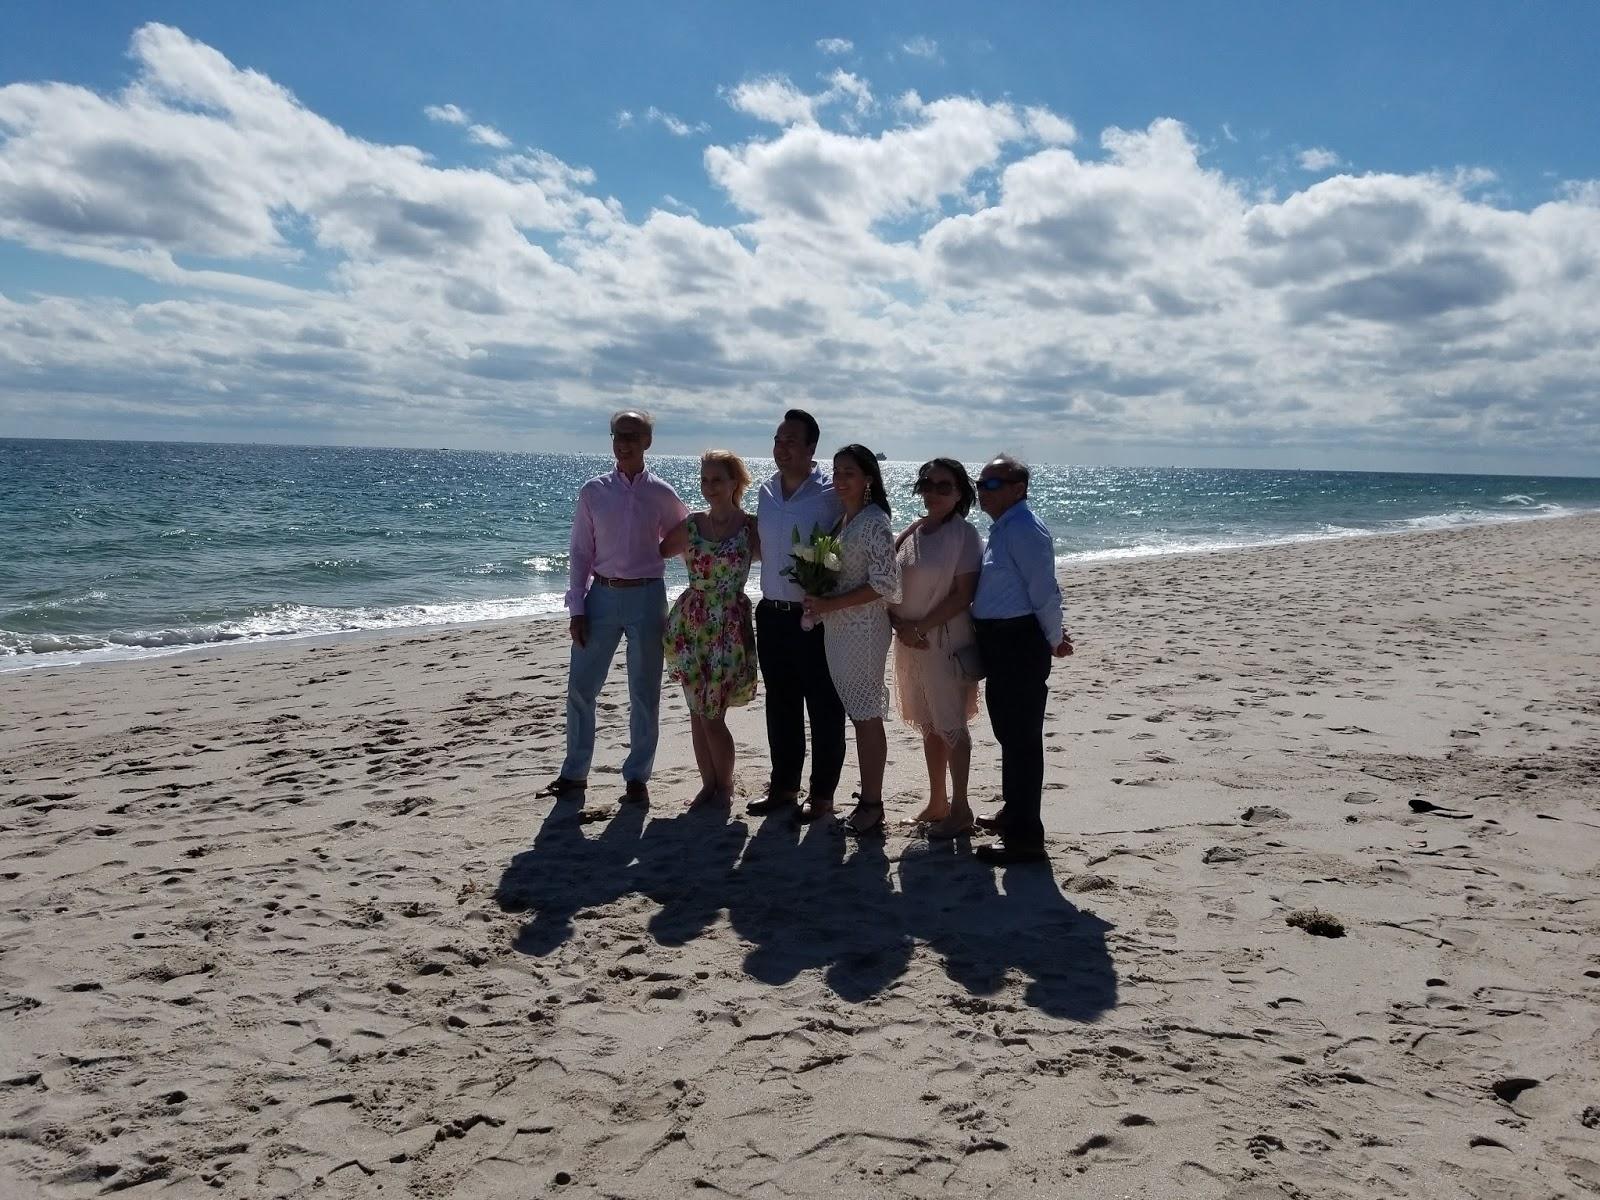 Married In Fort Lauderdale Vista Park Pompano Beach FL 33062 November 1 2017 Wedding Officiant